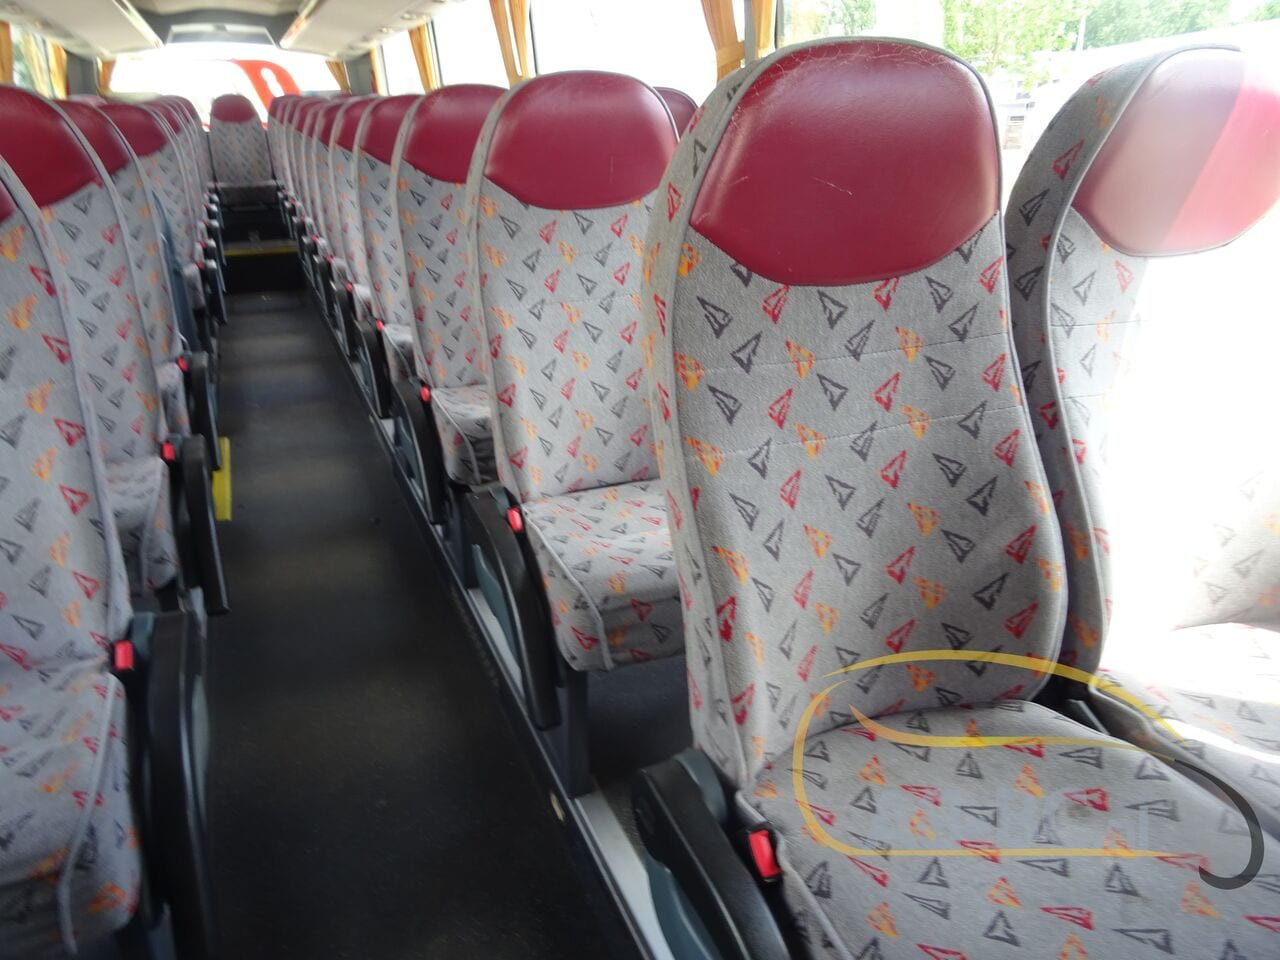 coach-busTEMSA-Safari-RD-DAF-Motor-53-Seats-Euro-5---1623932532072976431_big_6b8b9e8f13fe7ddc8b4cf231c4e8eadd--21061715155620919600